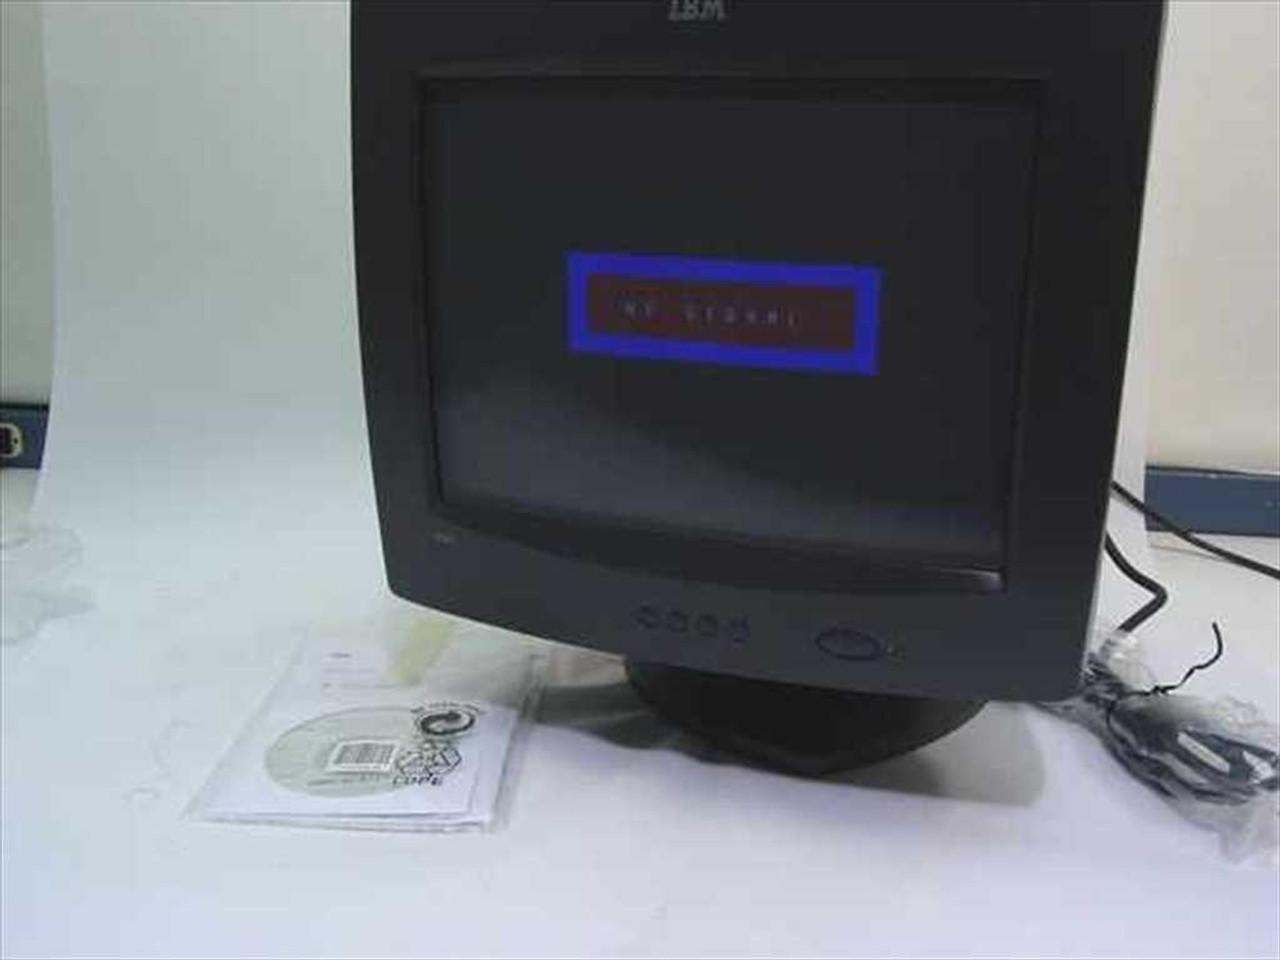 "... IBM 6331-47N 15"" SVGA E54 Monitor .28DP - Black 22P7924 ..."